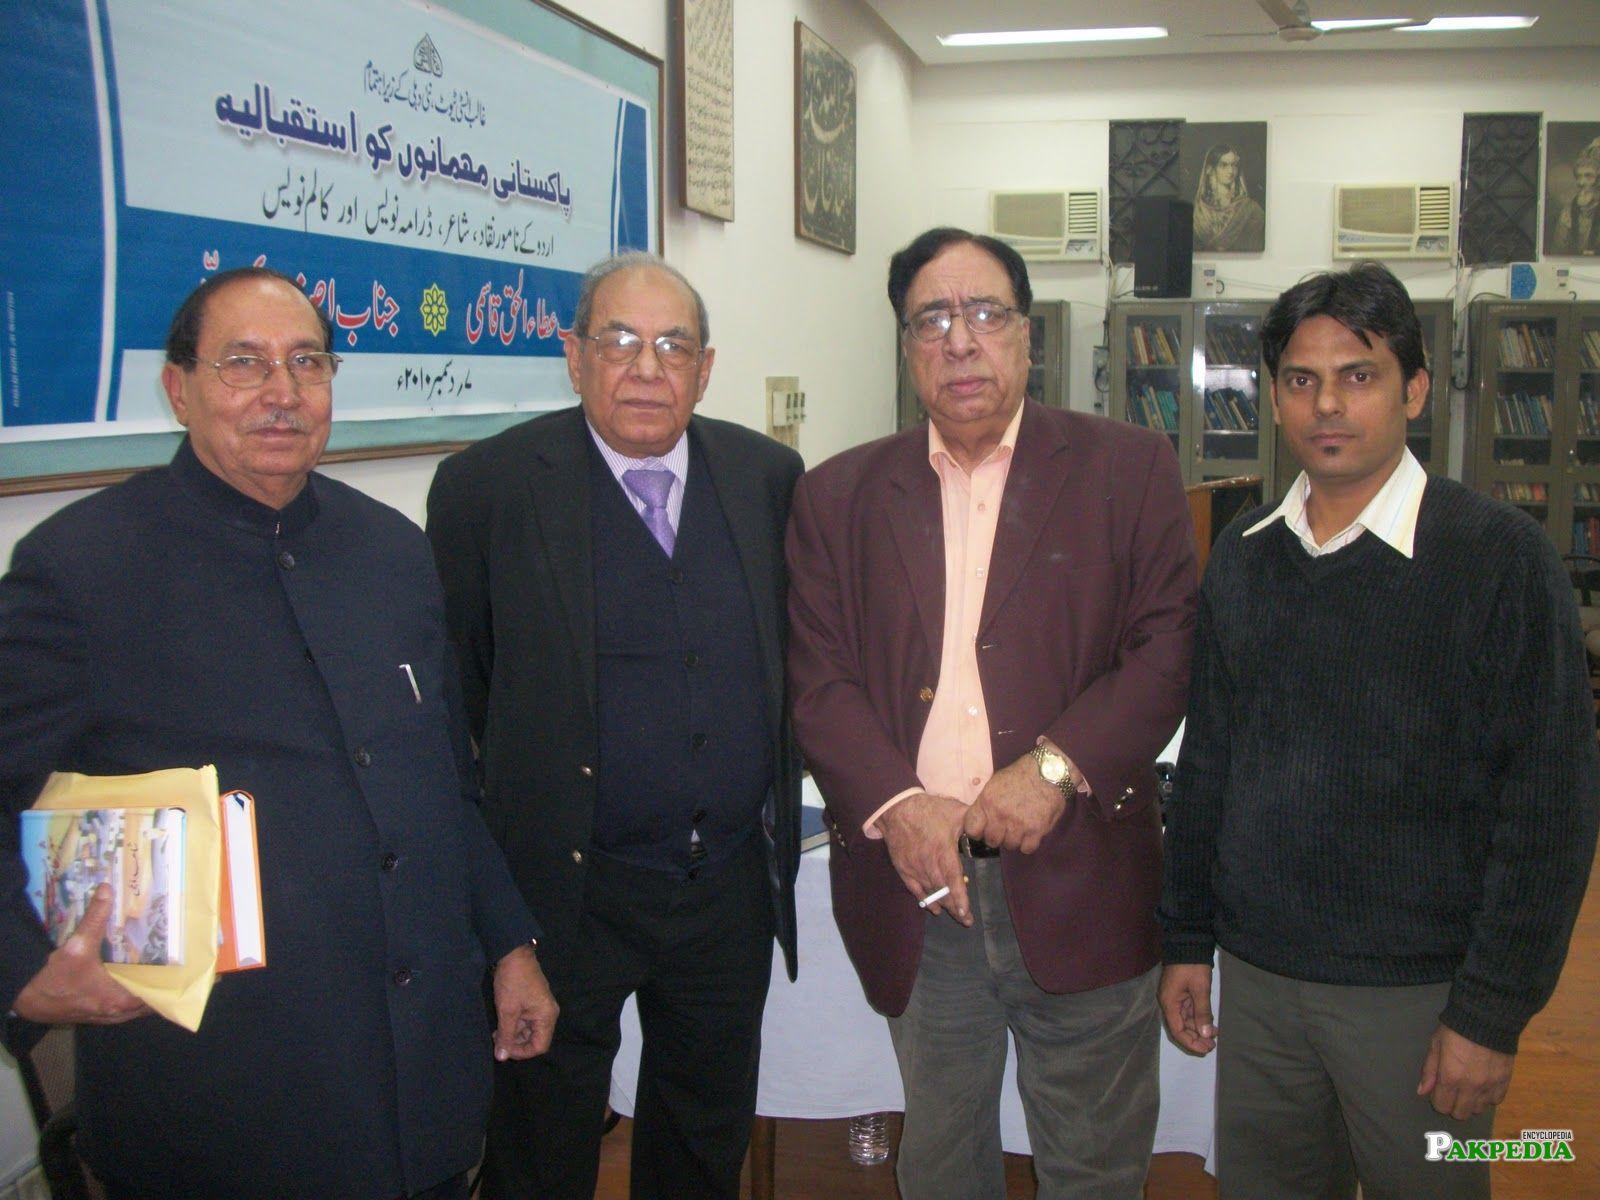 K.l. Narang Saqi, Shahid Mehdi, Ata ul Haq Qasmi (Pakistan), Jatinder Parwaaz